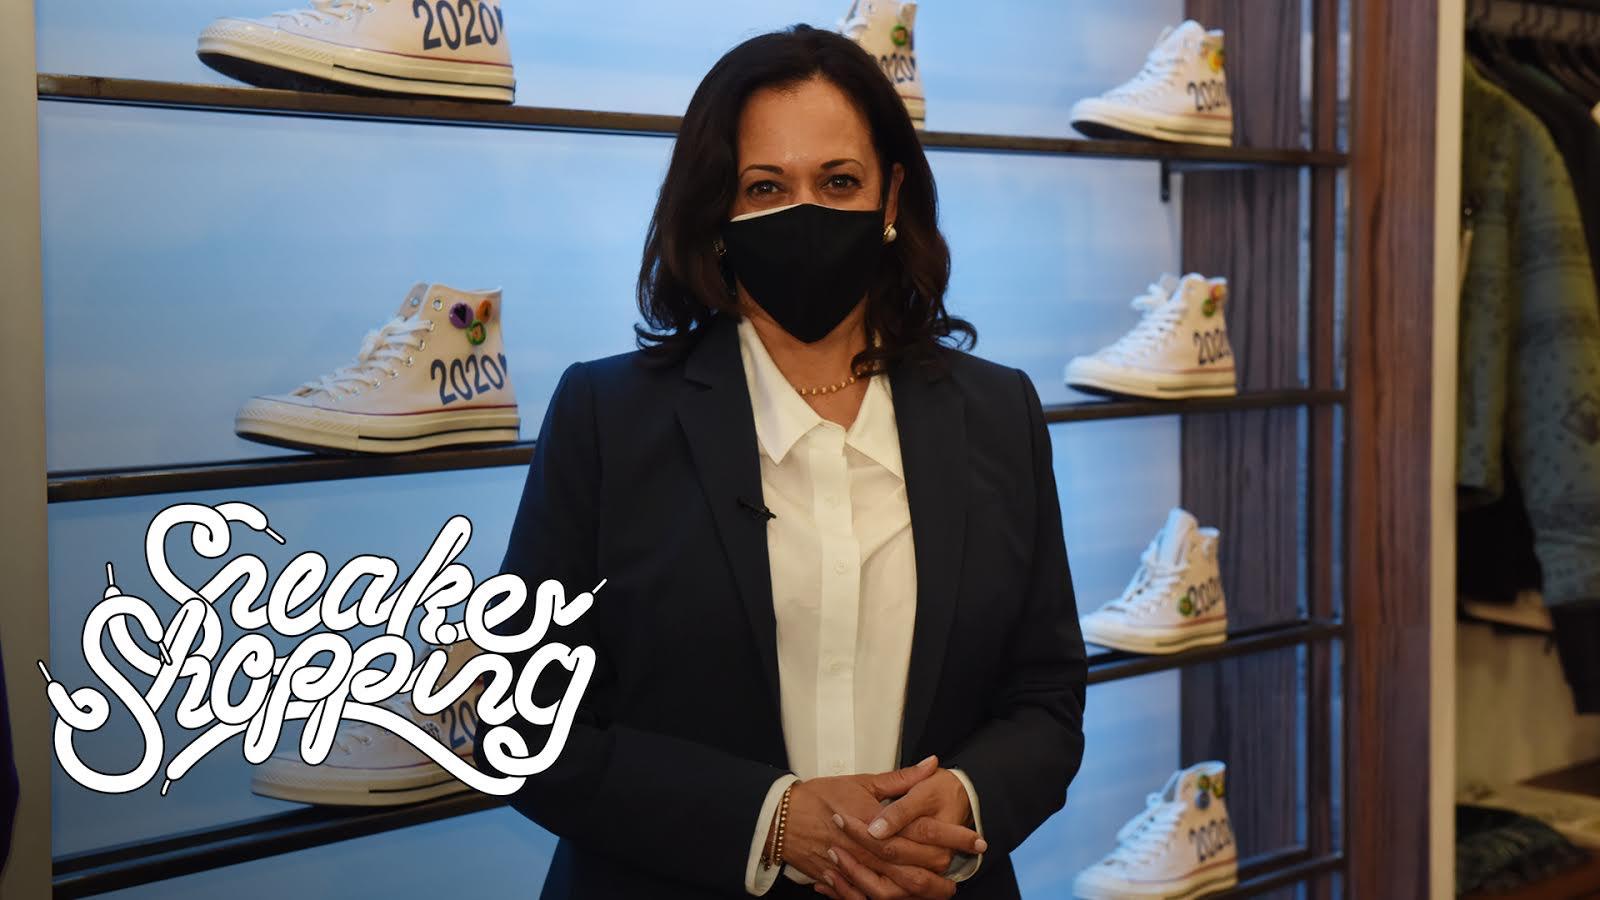 Kamala Harris On Sneaker Shopping